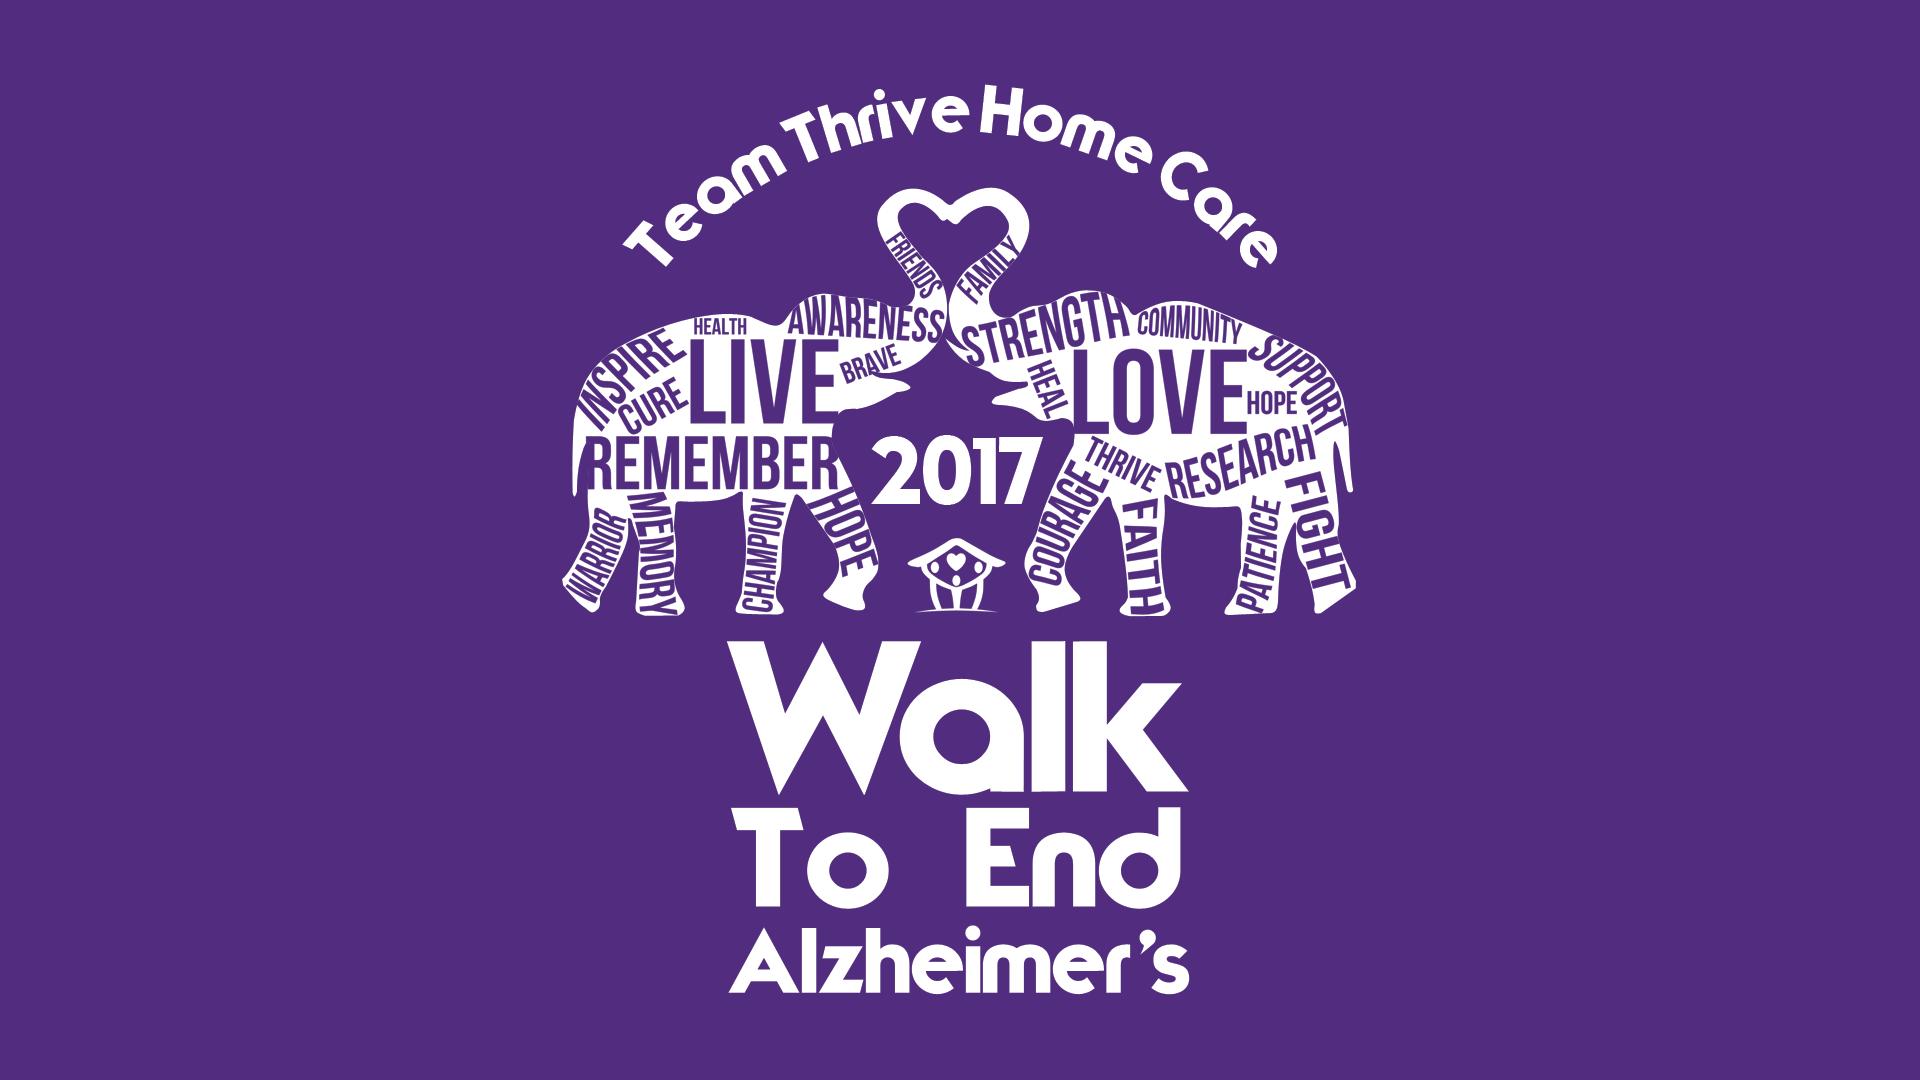 Team Thrive Home Care